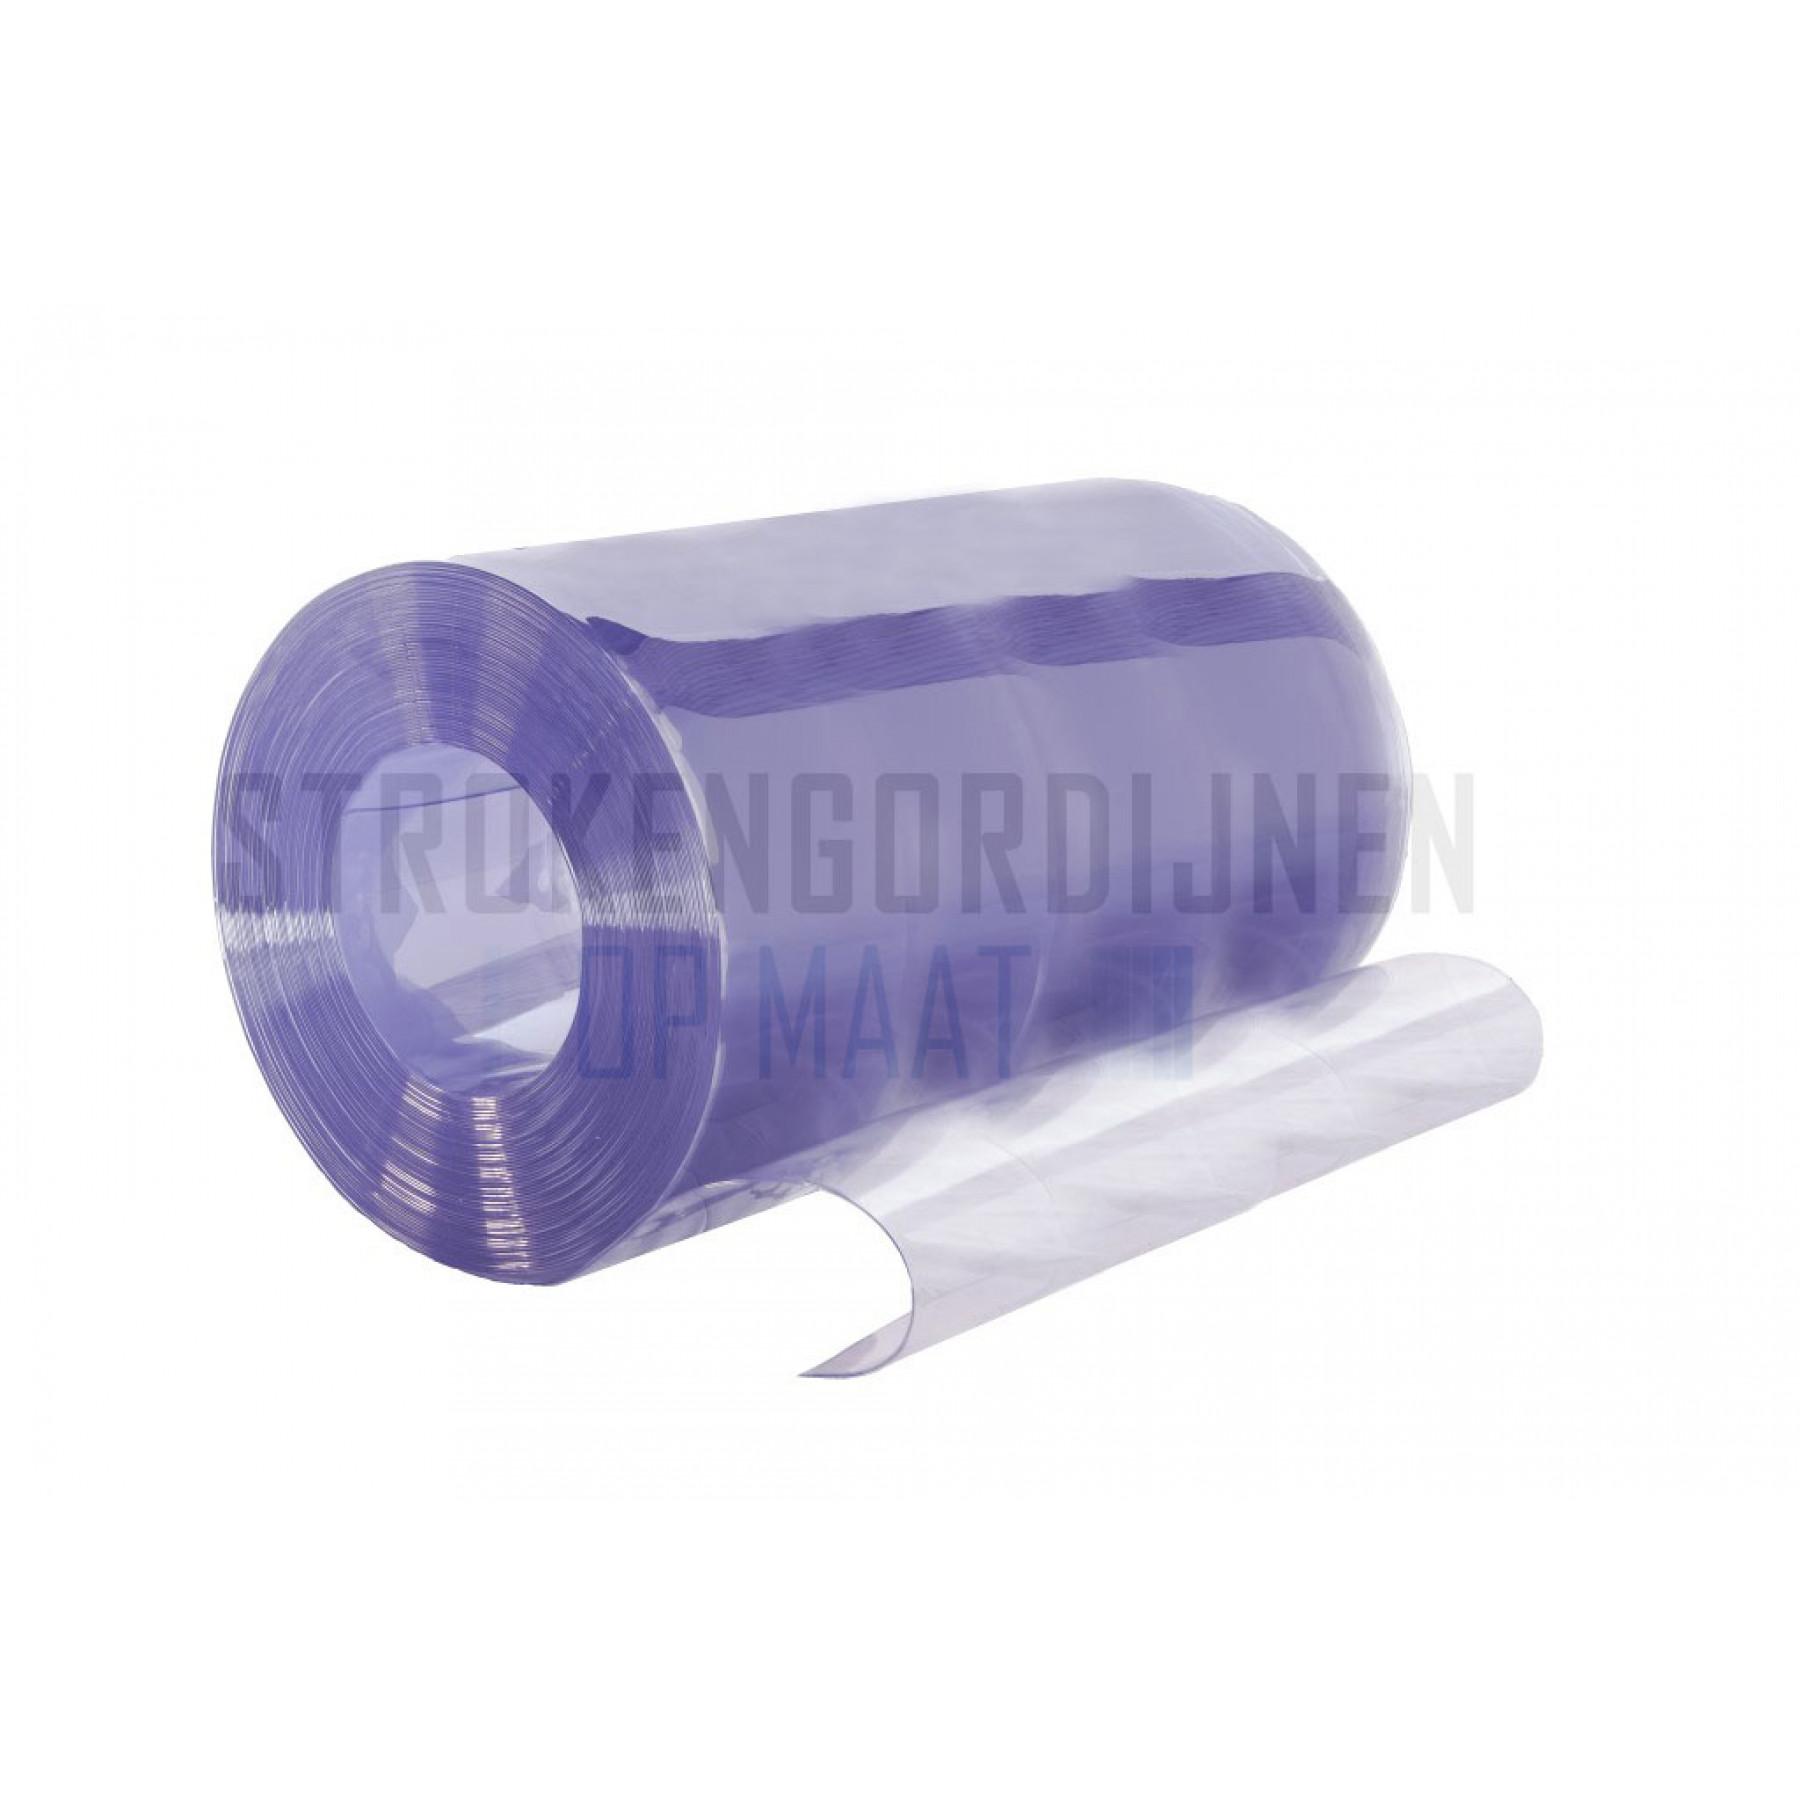 PVC Rolle 1200mm breit, 5mm dick, 20 Meter lang, transparent